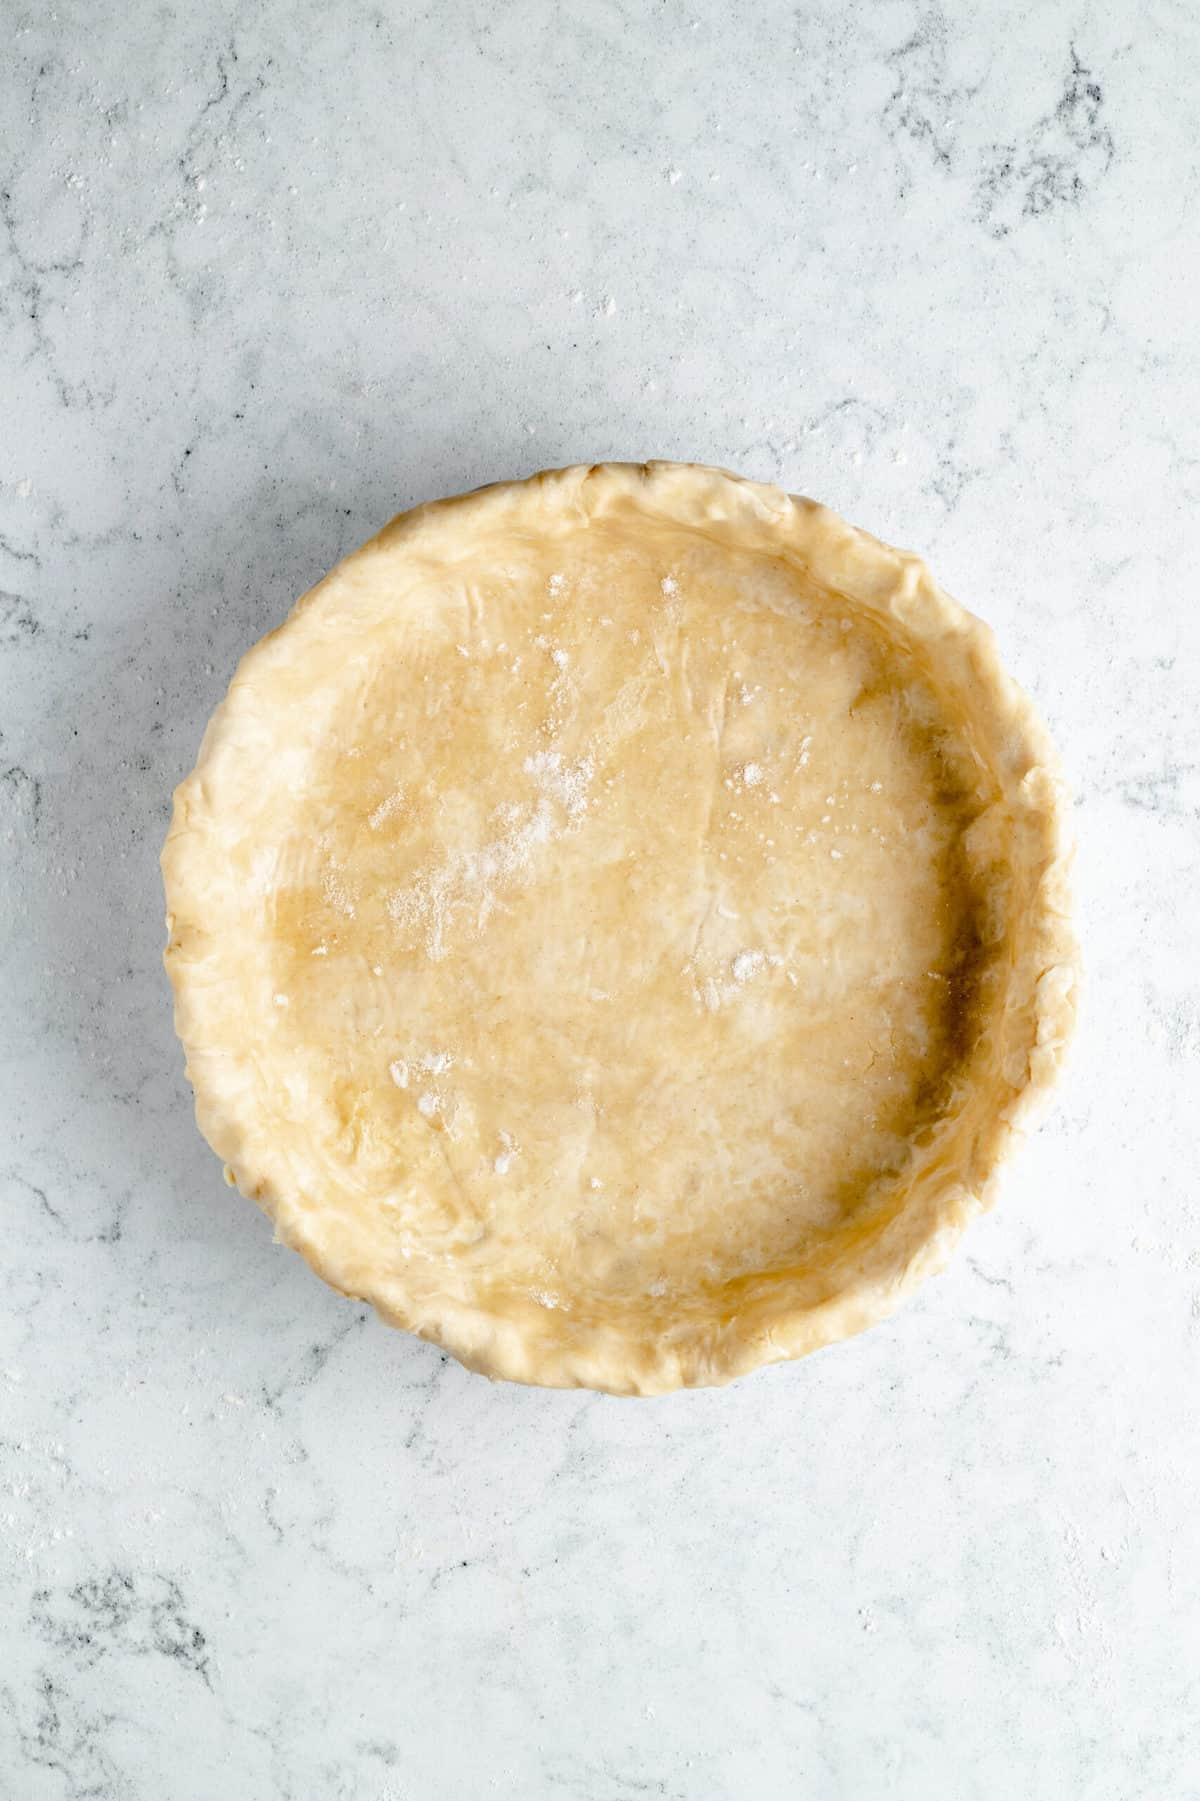 Vegan pie crust in a baking dish.